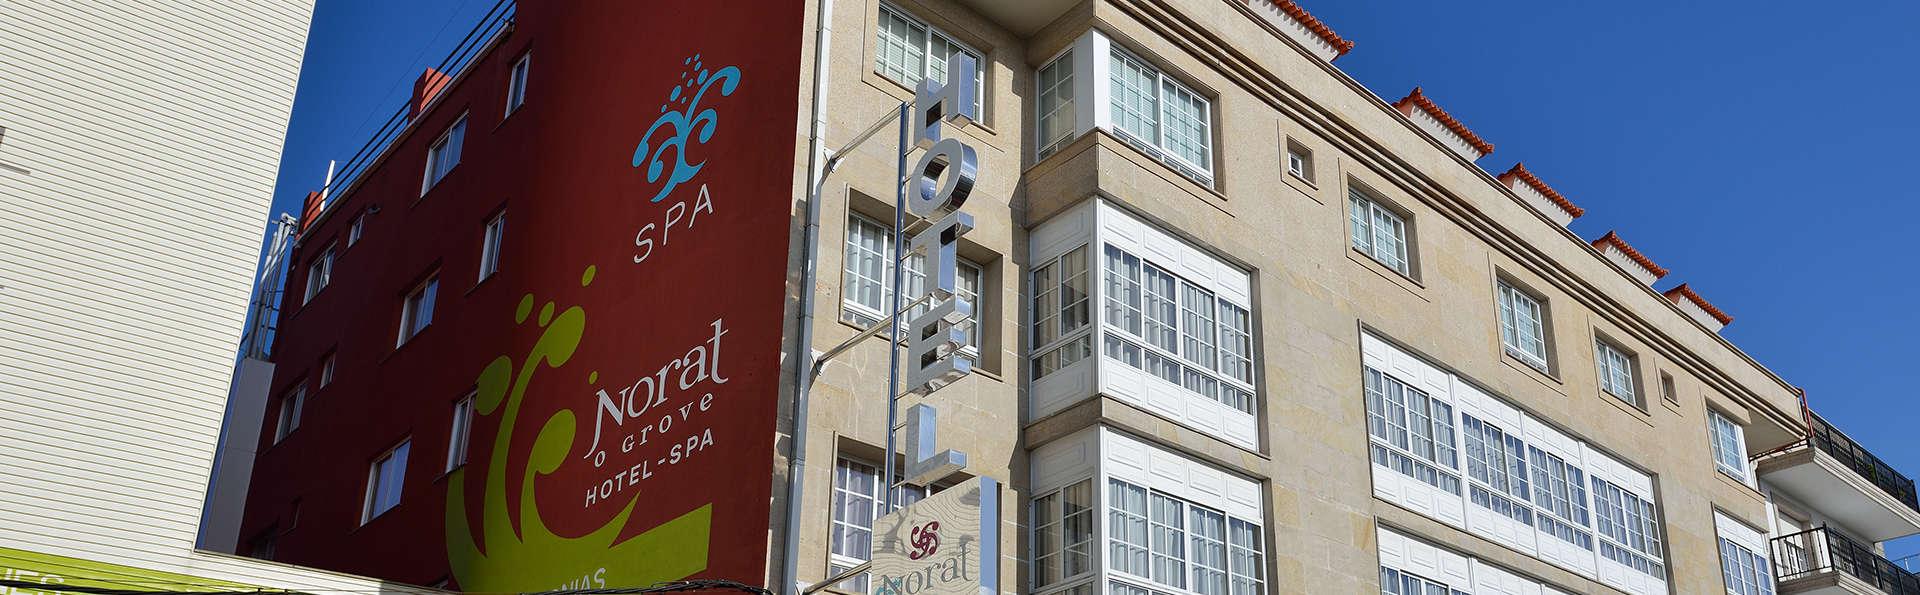 Hotel Spa Norat O Grove 3* Superior - edit_front3.jpg